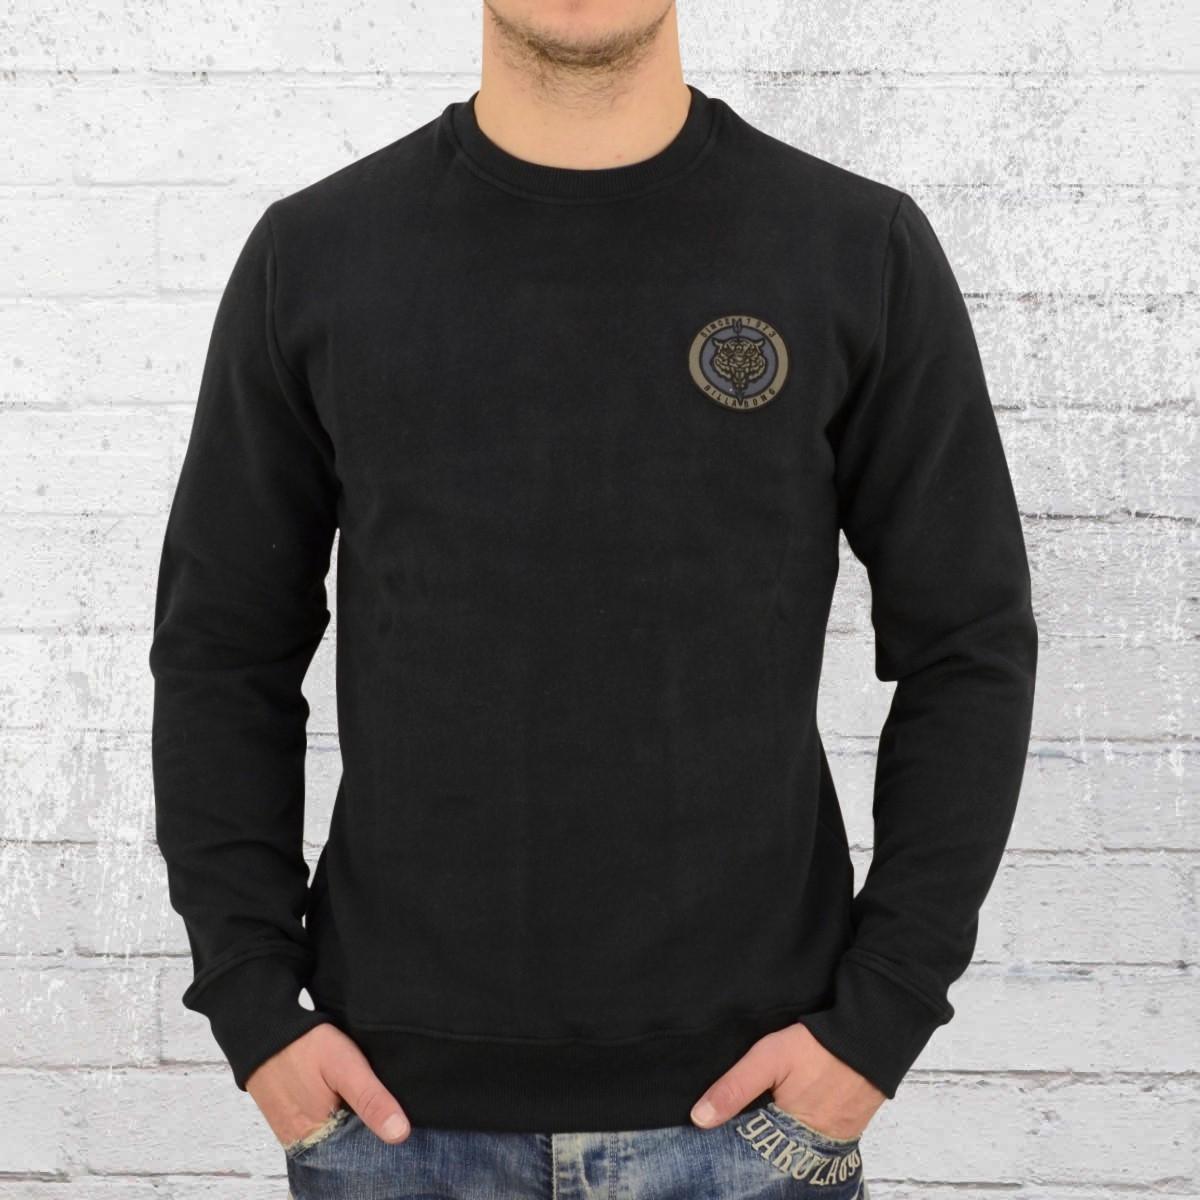 Billabong Herren Sweater Patrol Crew phantom schwarz